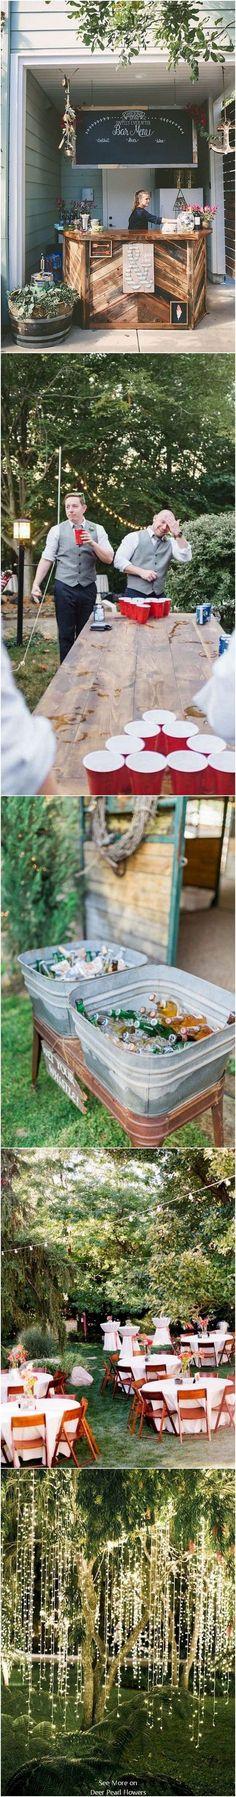 Intimate Backyard Outdoor Wedding Decor Ideas #backyardwedding #outdoorwedding #countrywedding #weddingdecor ❤️http://www.deerpearlflowers.com/intimate-backyard-outdoor-wedding-ideas/